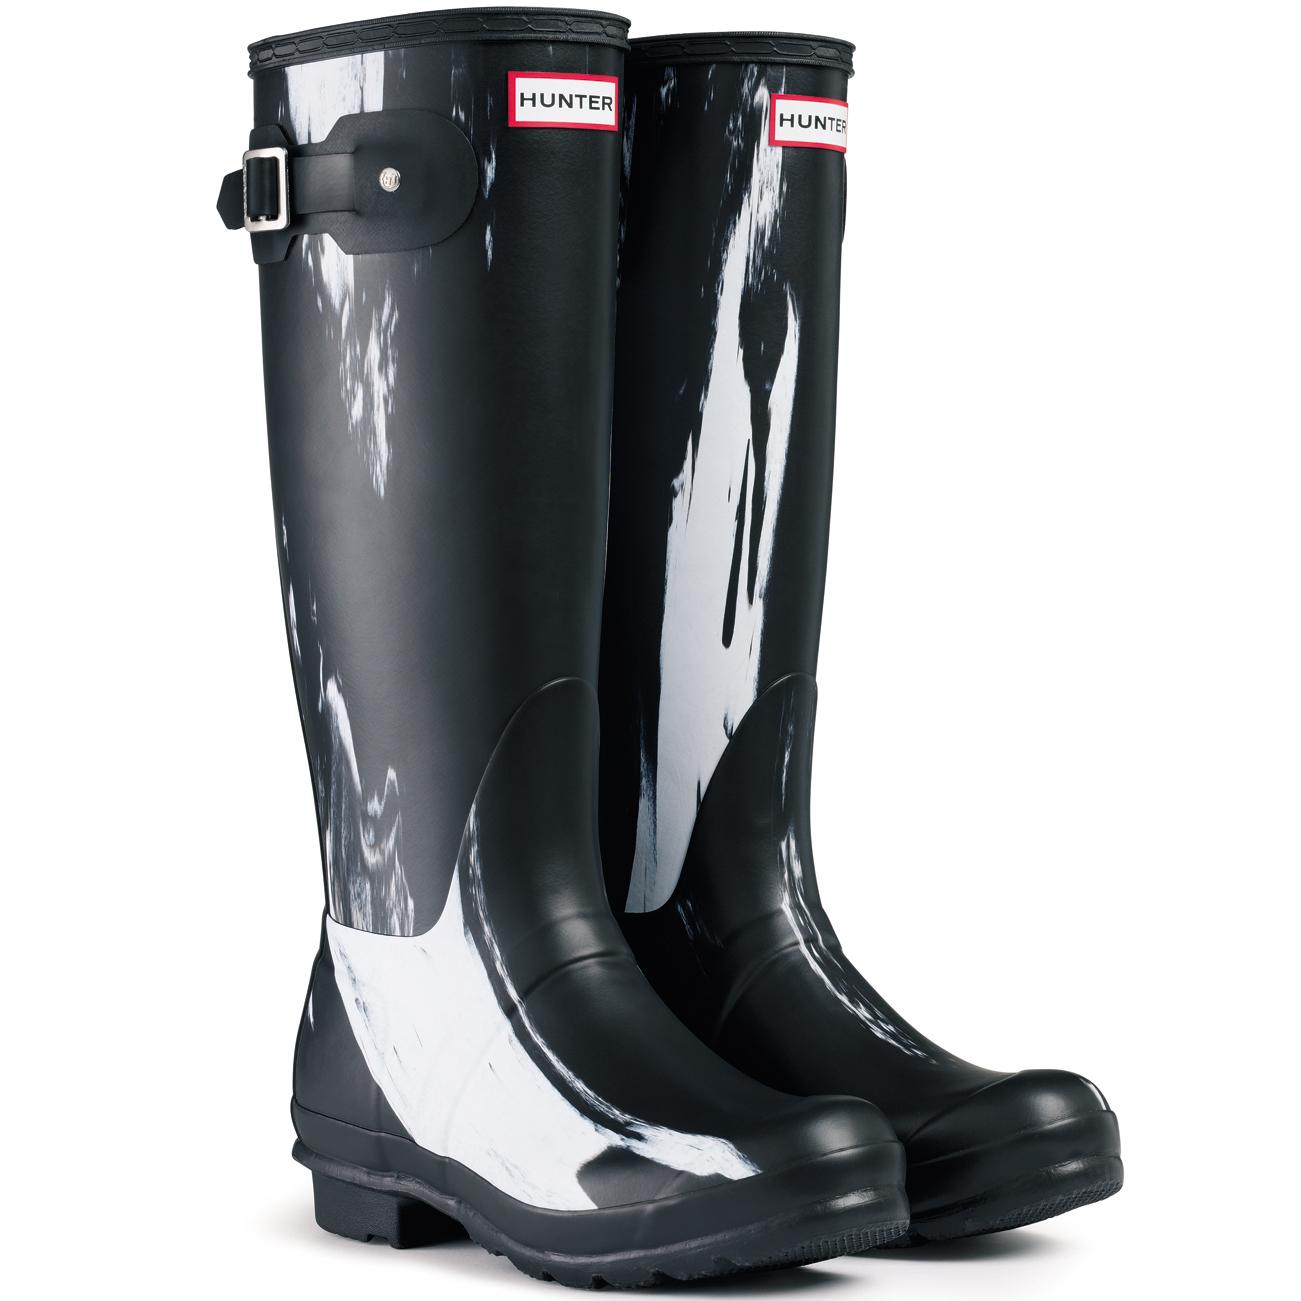 Original Womens Hunter Original Tall Winter Wellington Snow Muck Yard Rain Boots US 5-11 | EBay